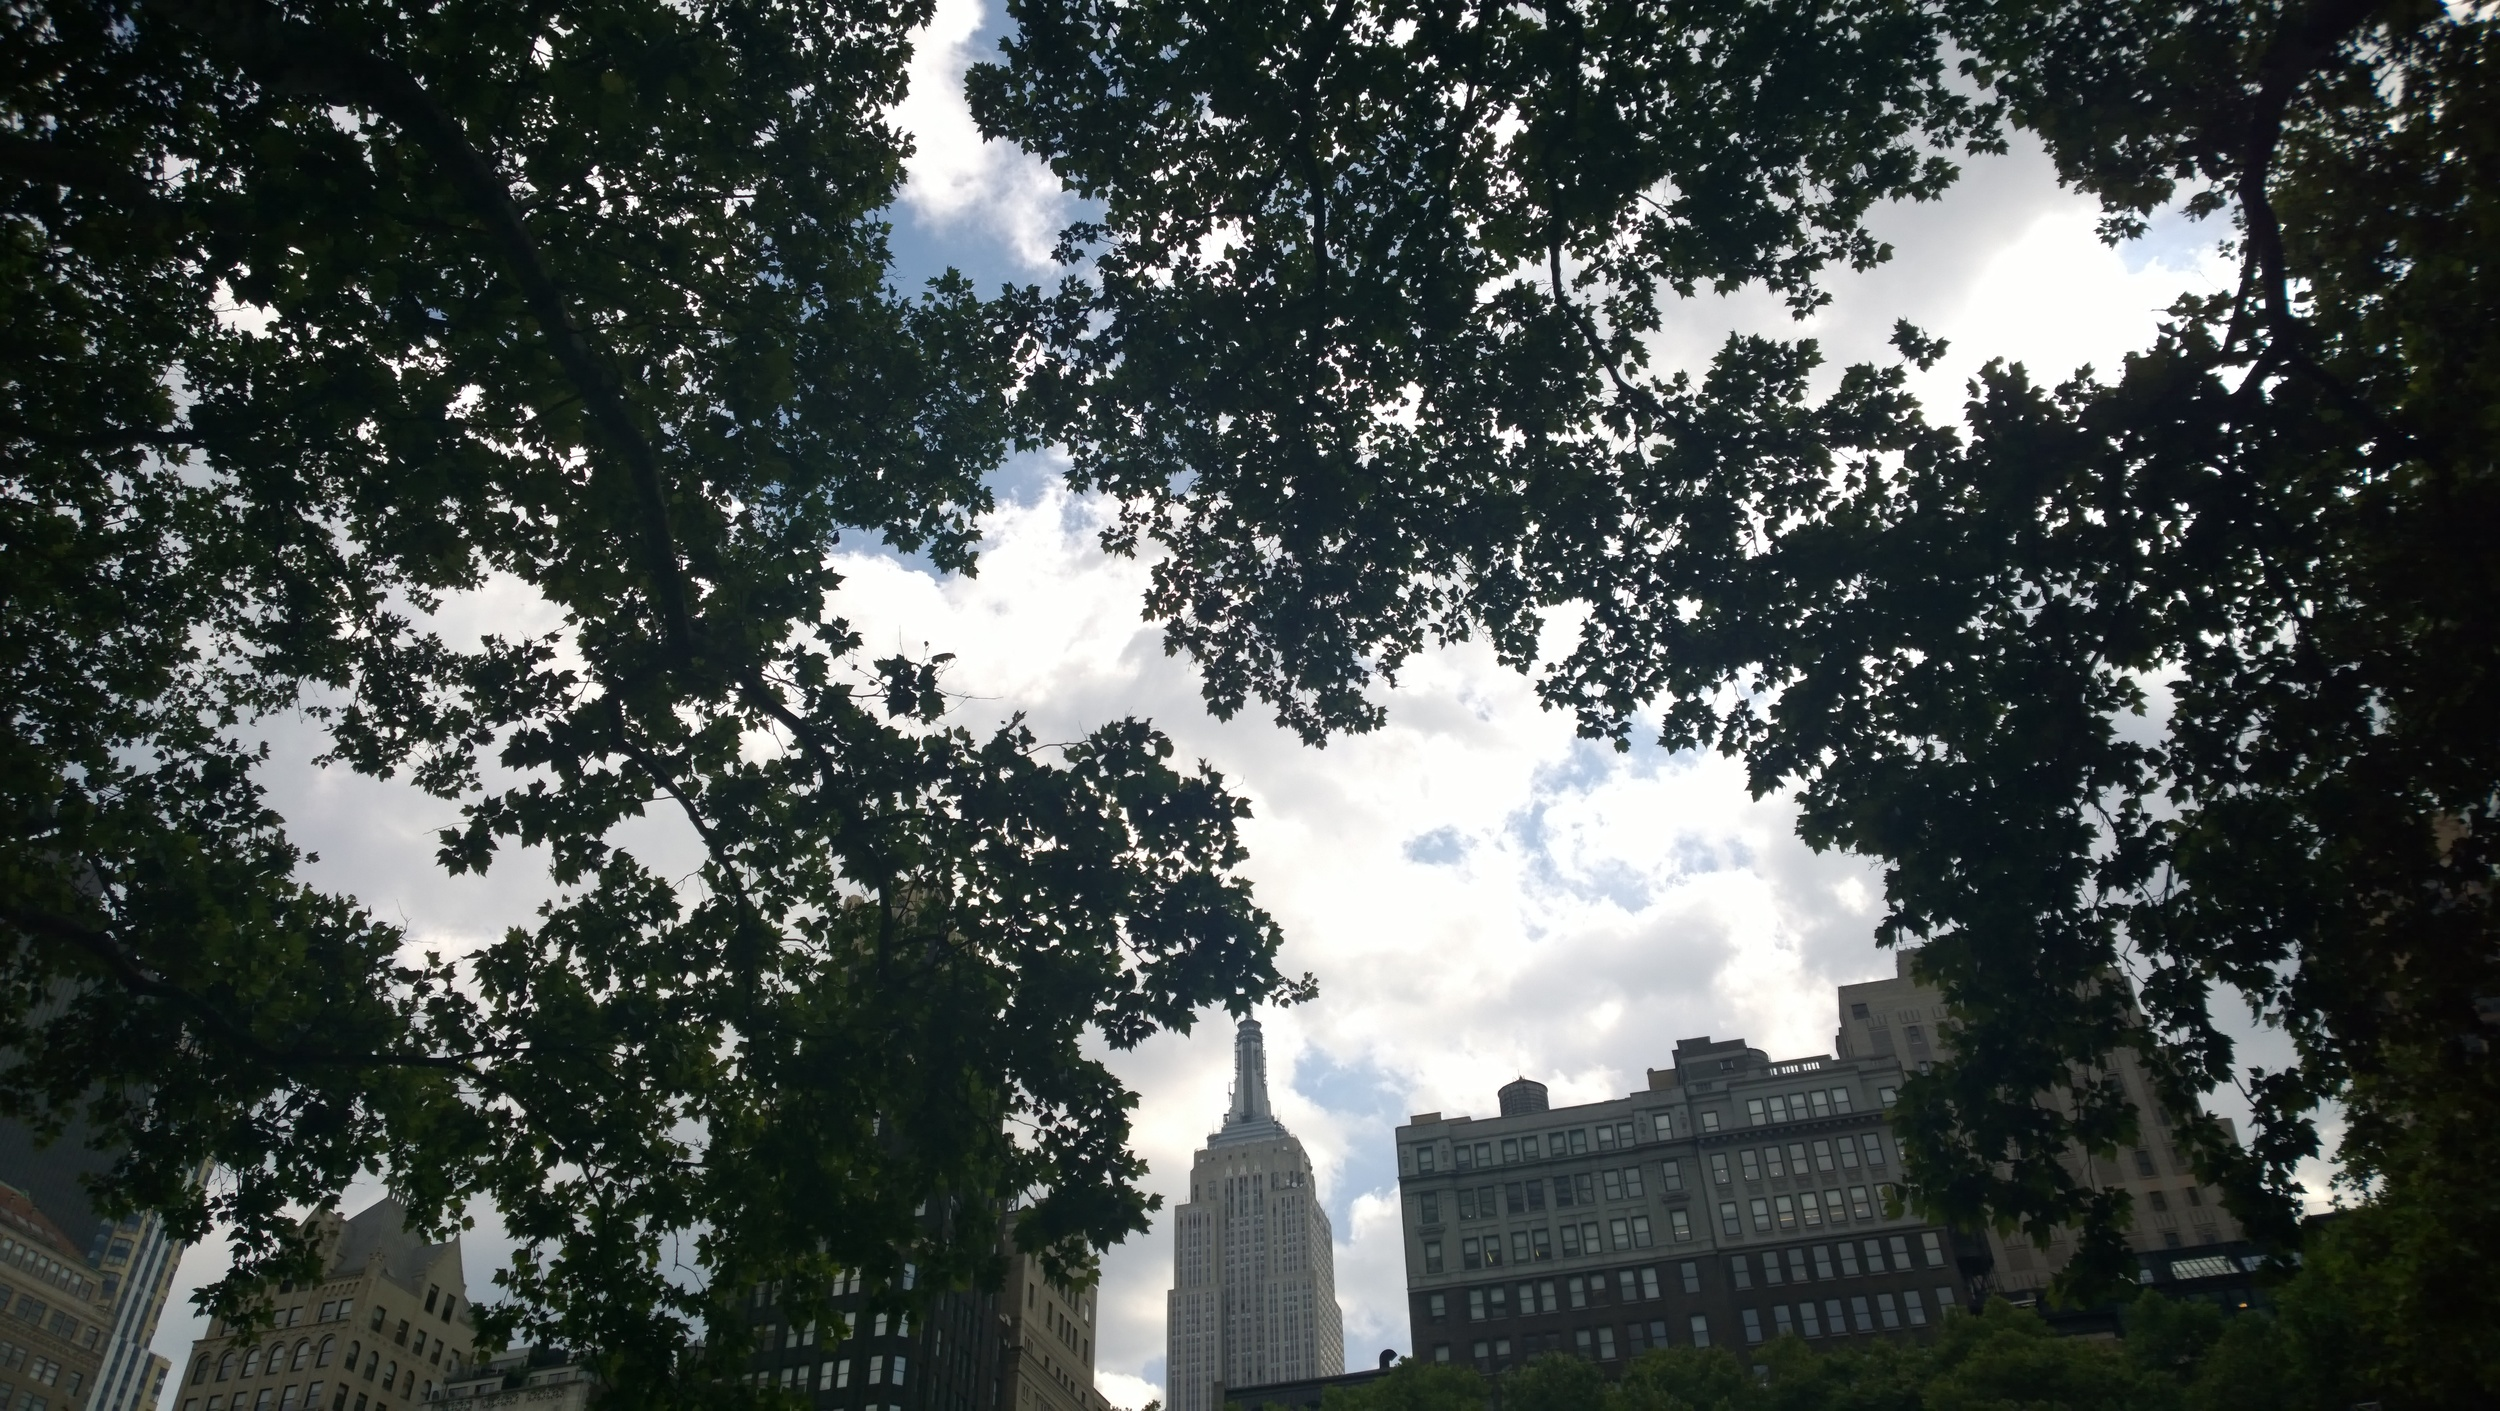 Bryant Park, New York June 2015